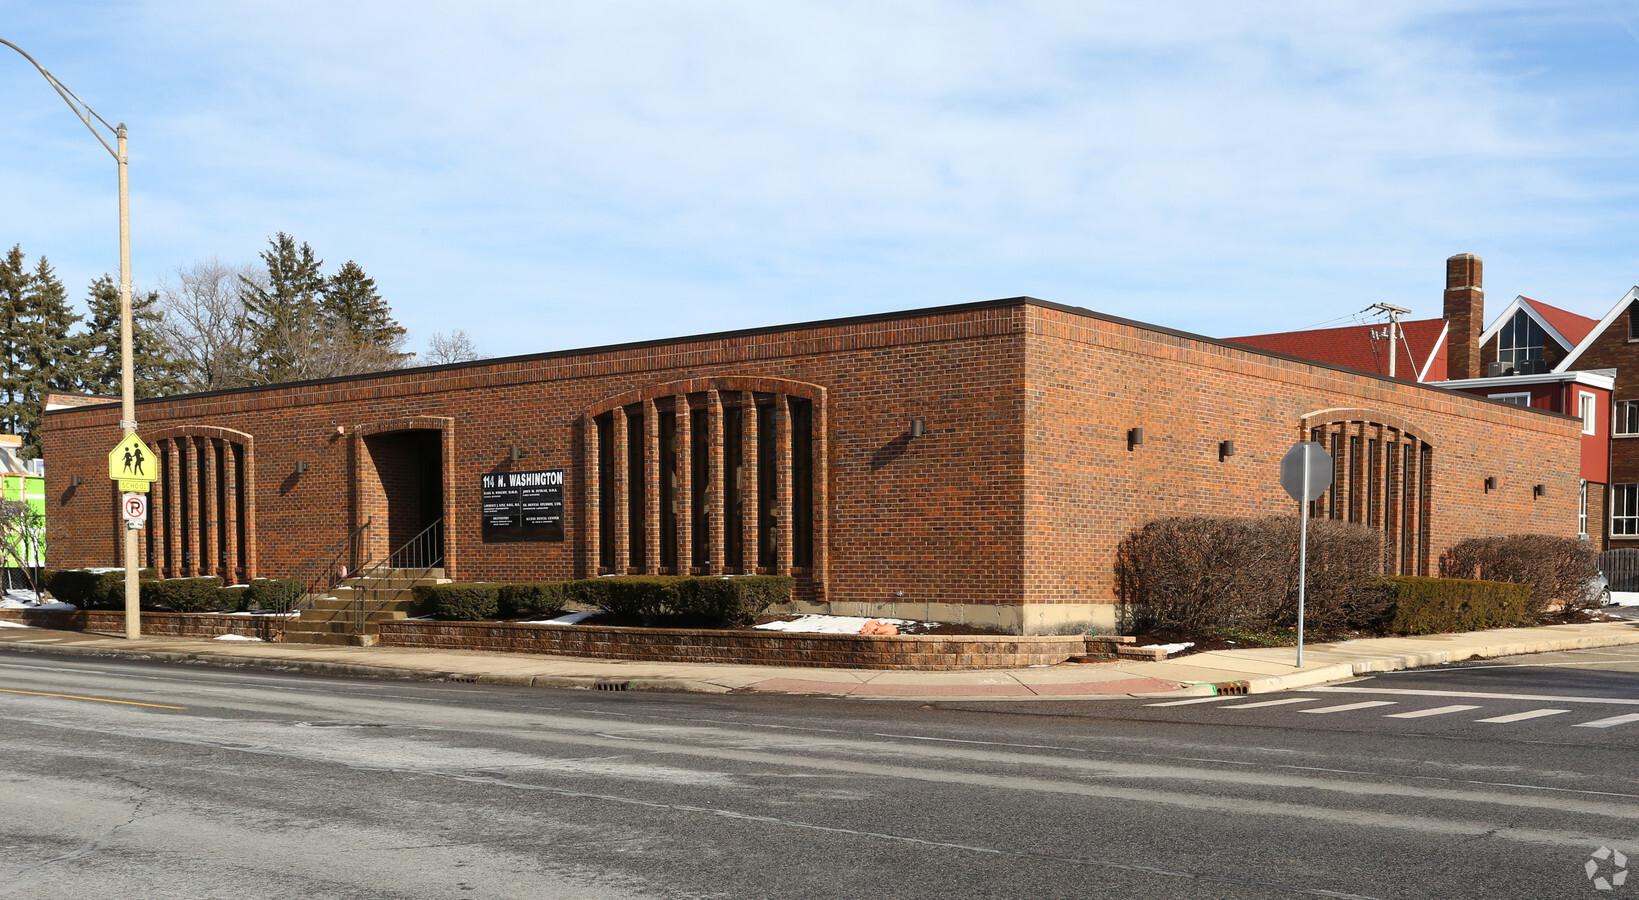 114 N Washington Street   I   Naperville, IL